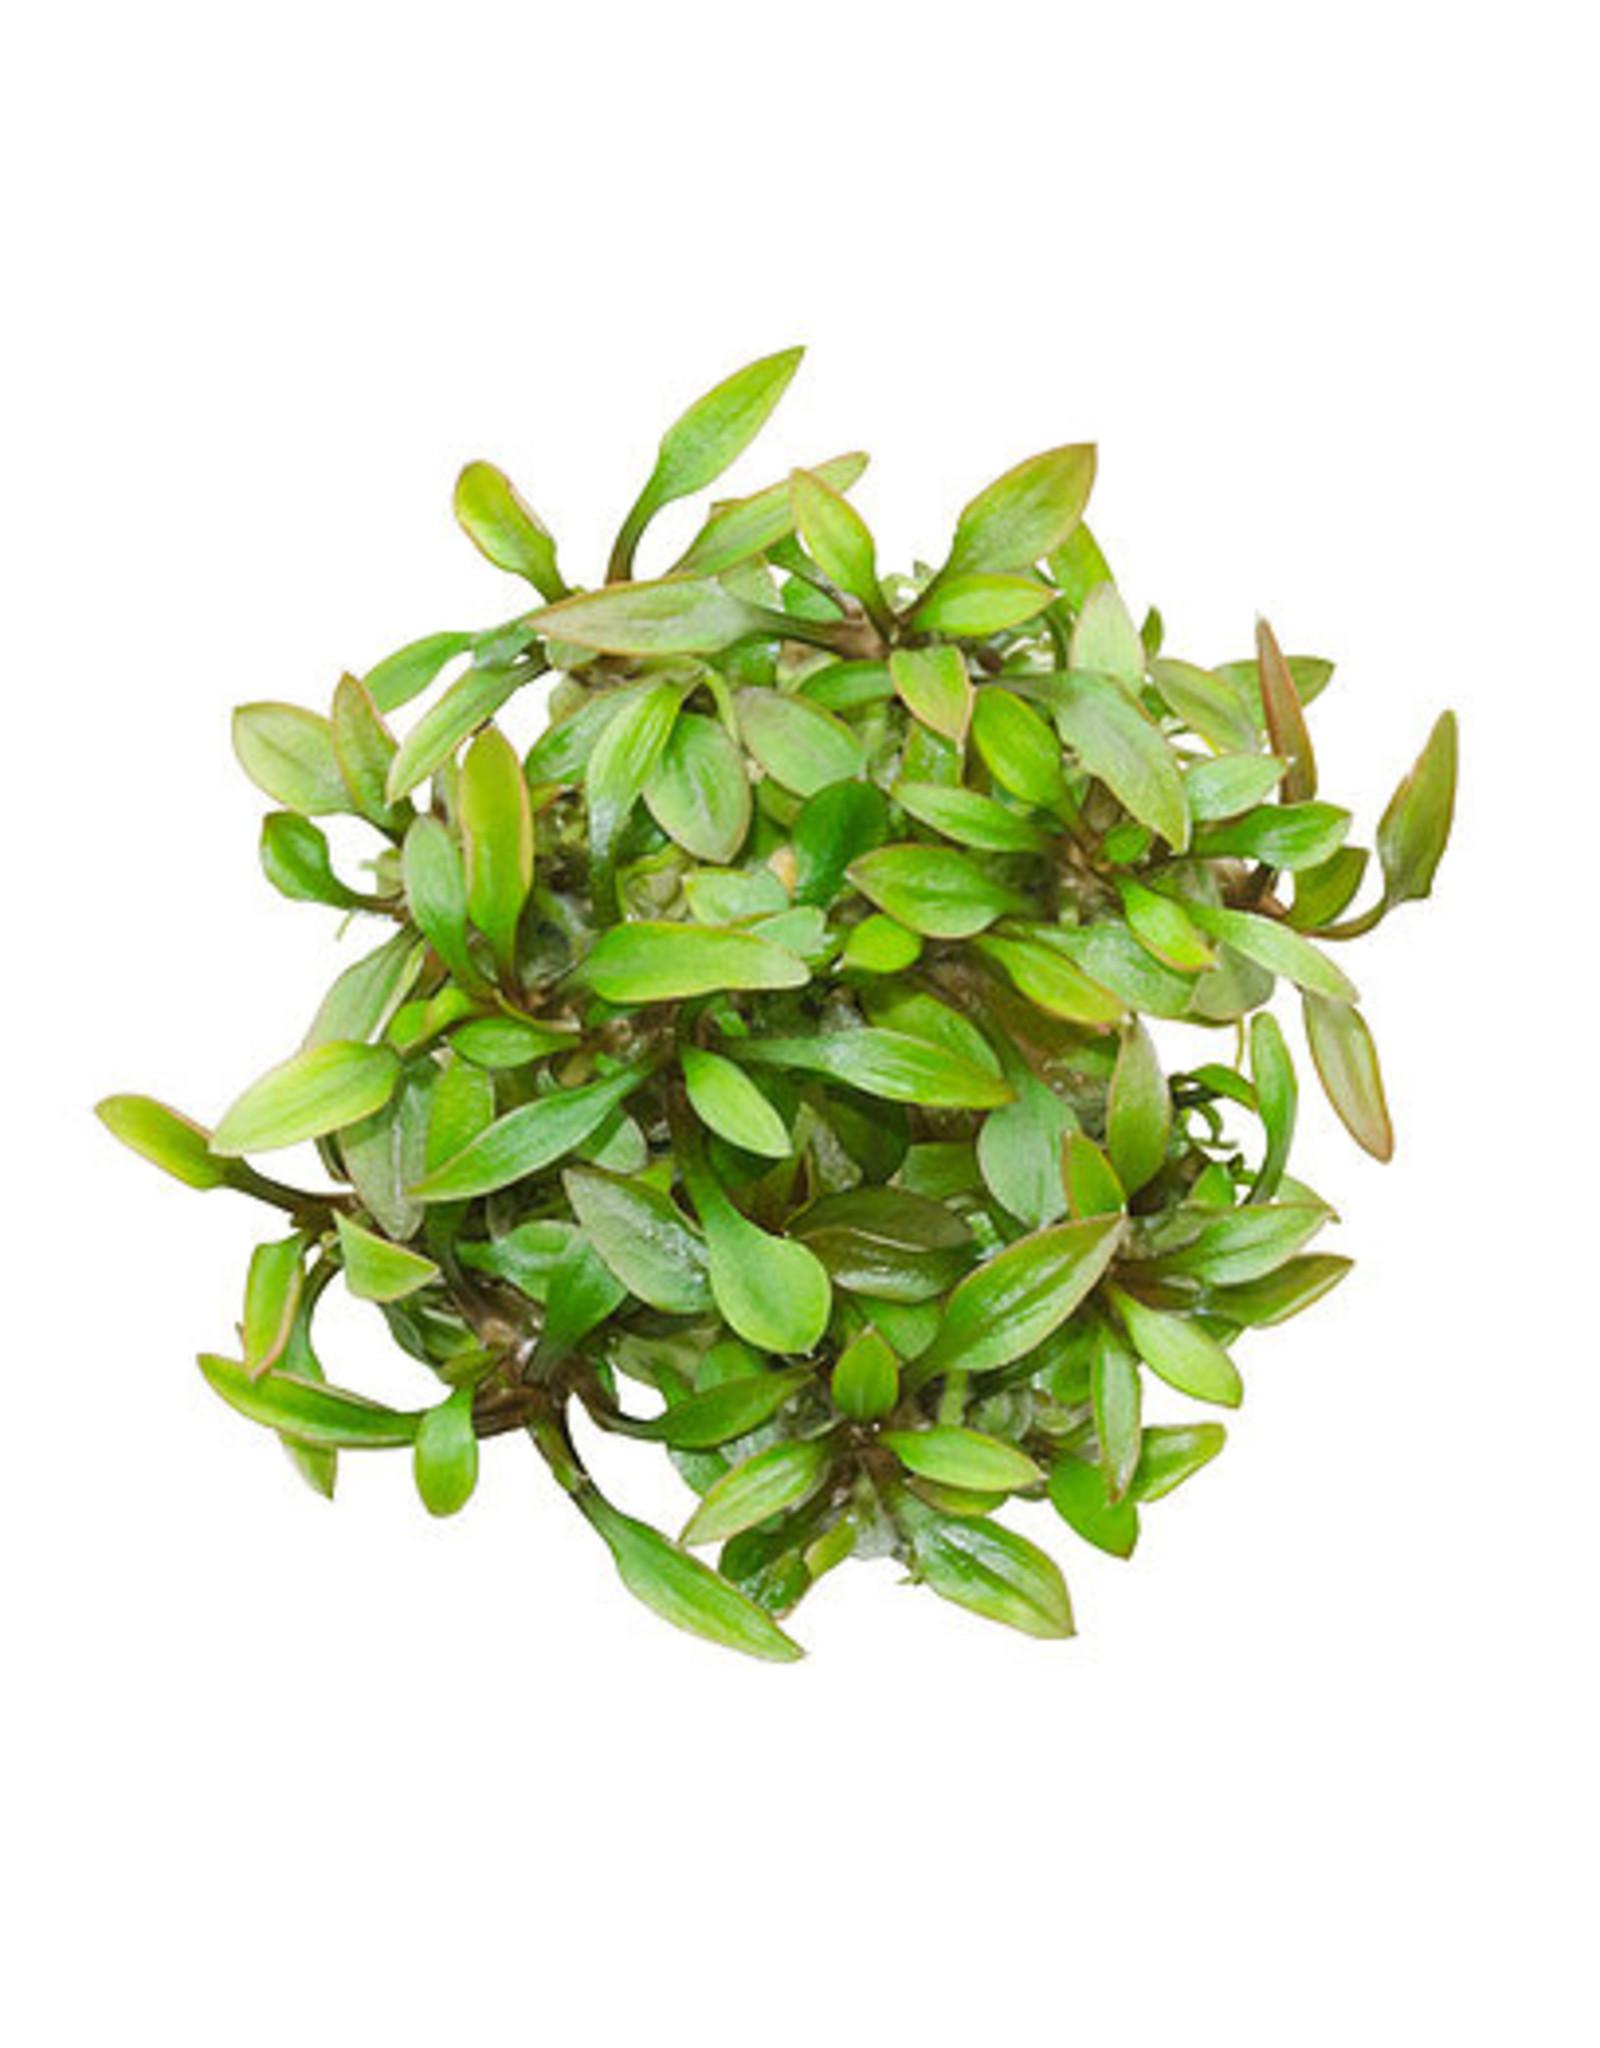 ABC Plants ABC PLANTS - Cryptocoryne lutea